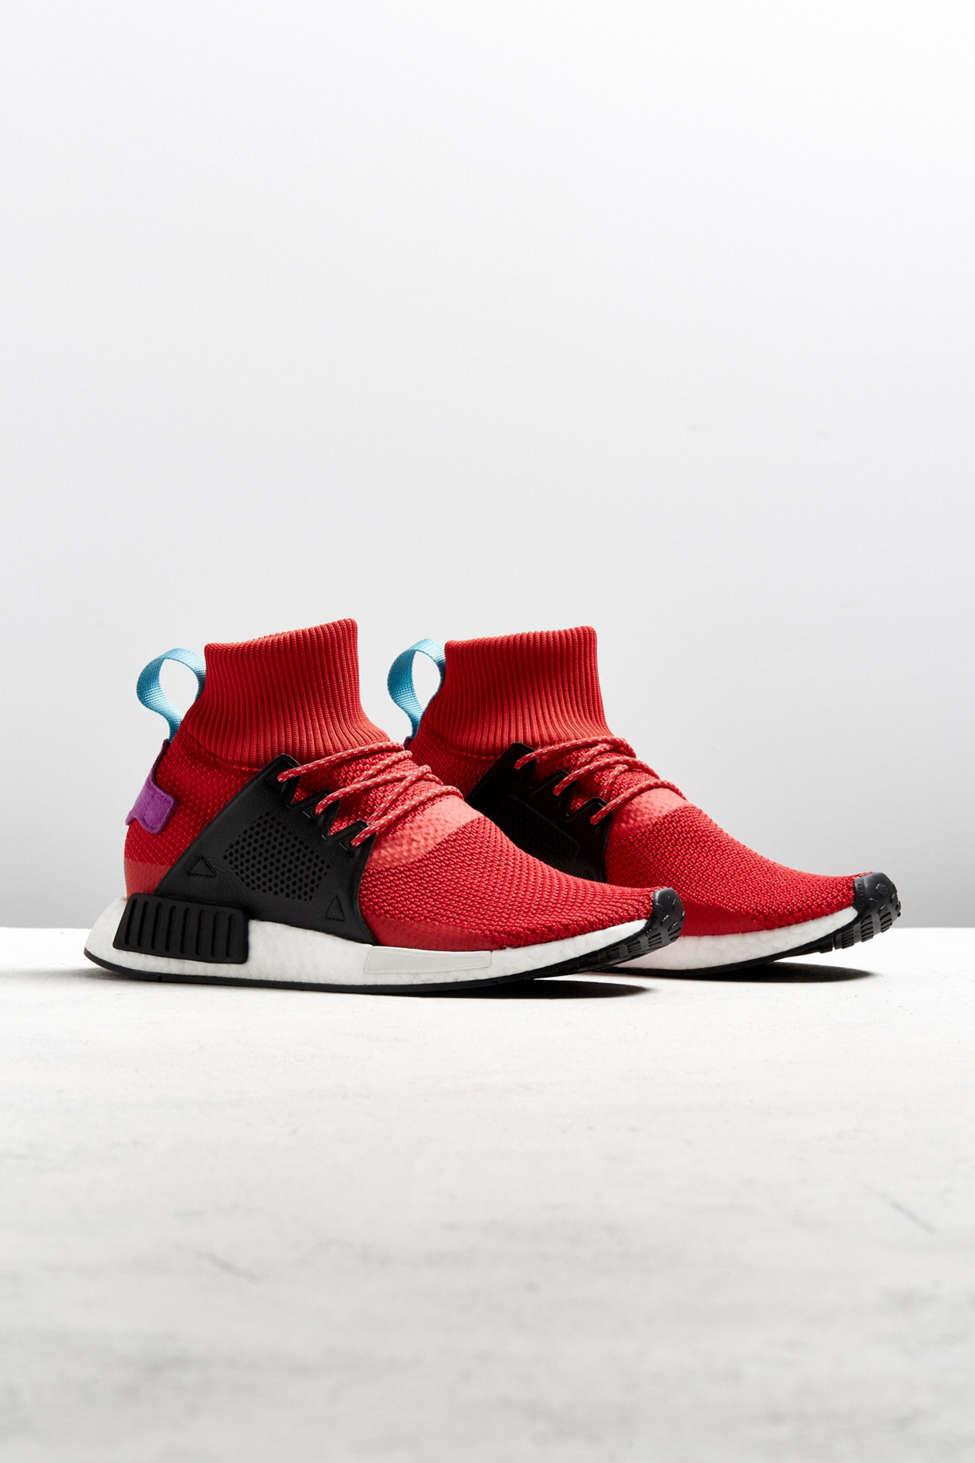 adidas nmd rt inverno primeknit scarpe urban outfitters